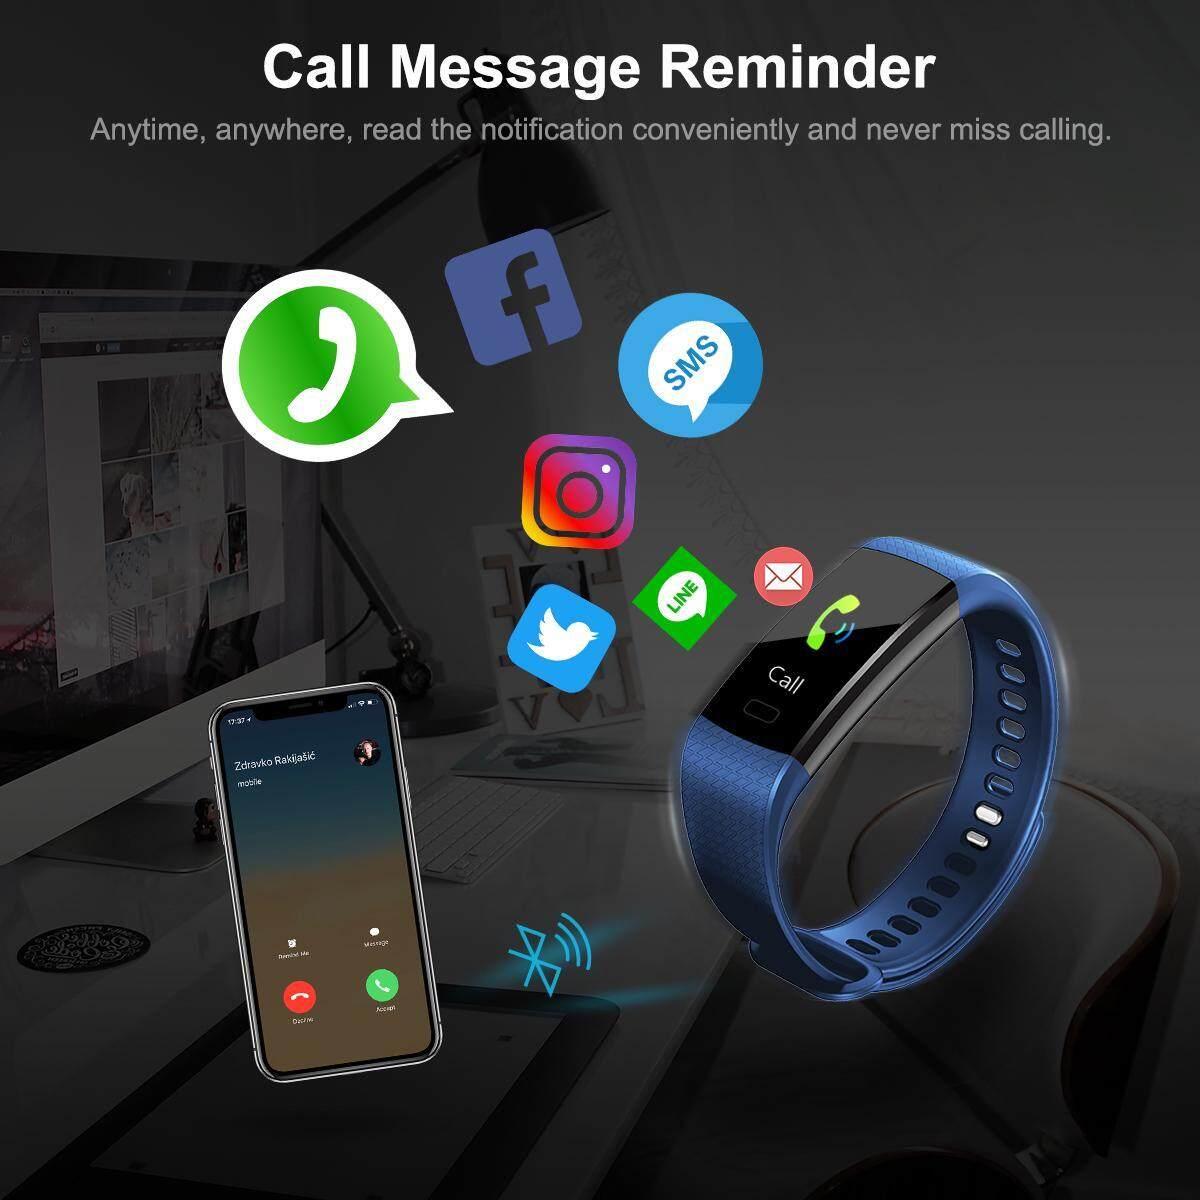 Smart Watch นาฬิกาอัจริยะ วัดความดัน วัดการวิ่ง เตือนการโทรเข้า ตั้งปลุก นาฬิกา Smart Barnd นาฬิกาที่ตอบโจทย์ ใส่ได้ทุกเพศ ทุกวัย รุ่น M4 By Allbag.